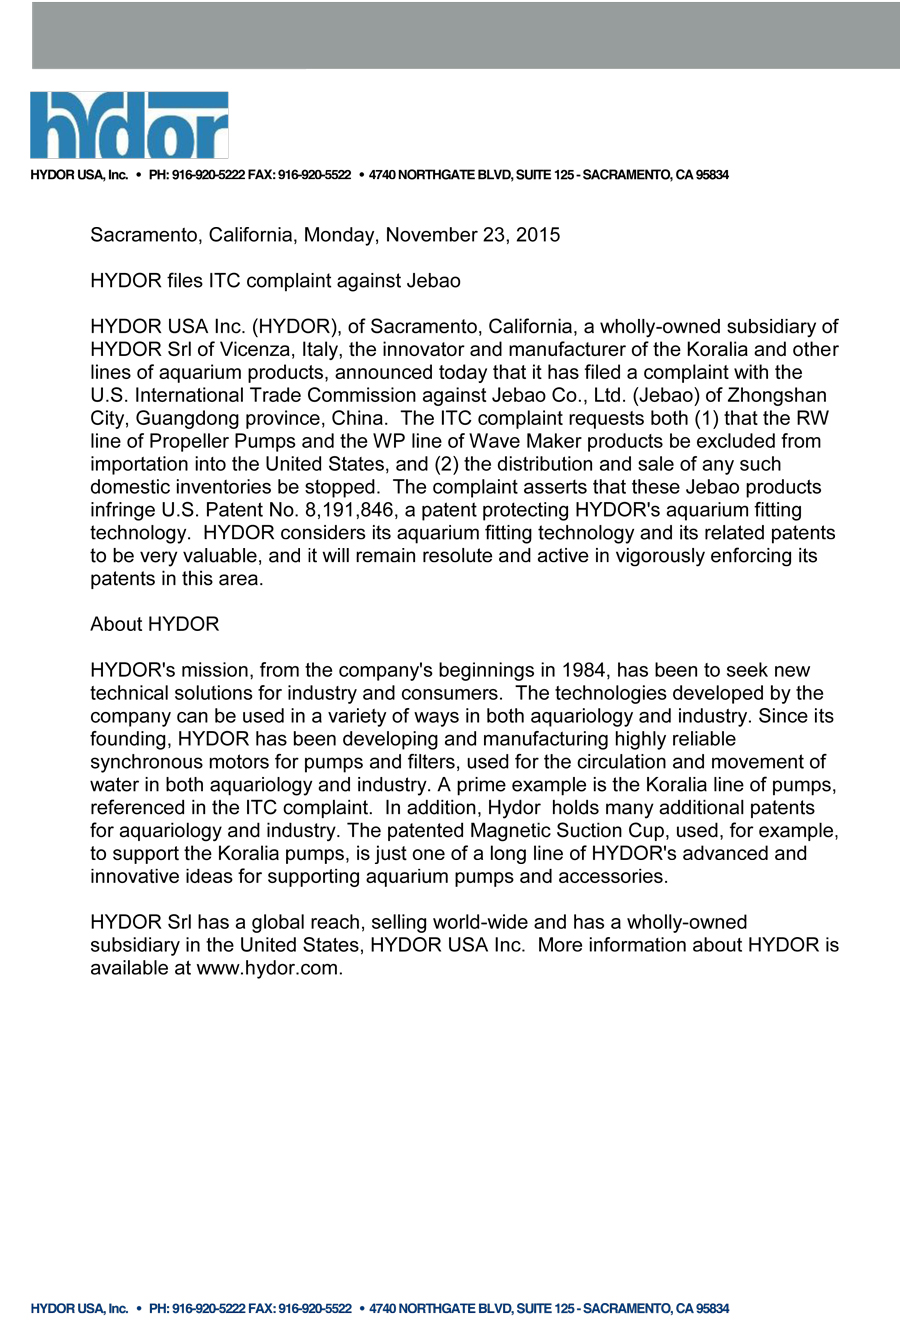 Press-Release-PDF_11-23-2015